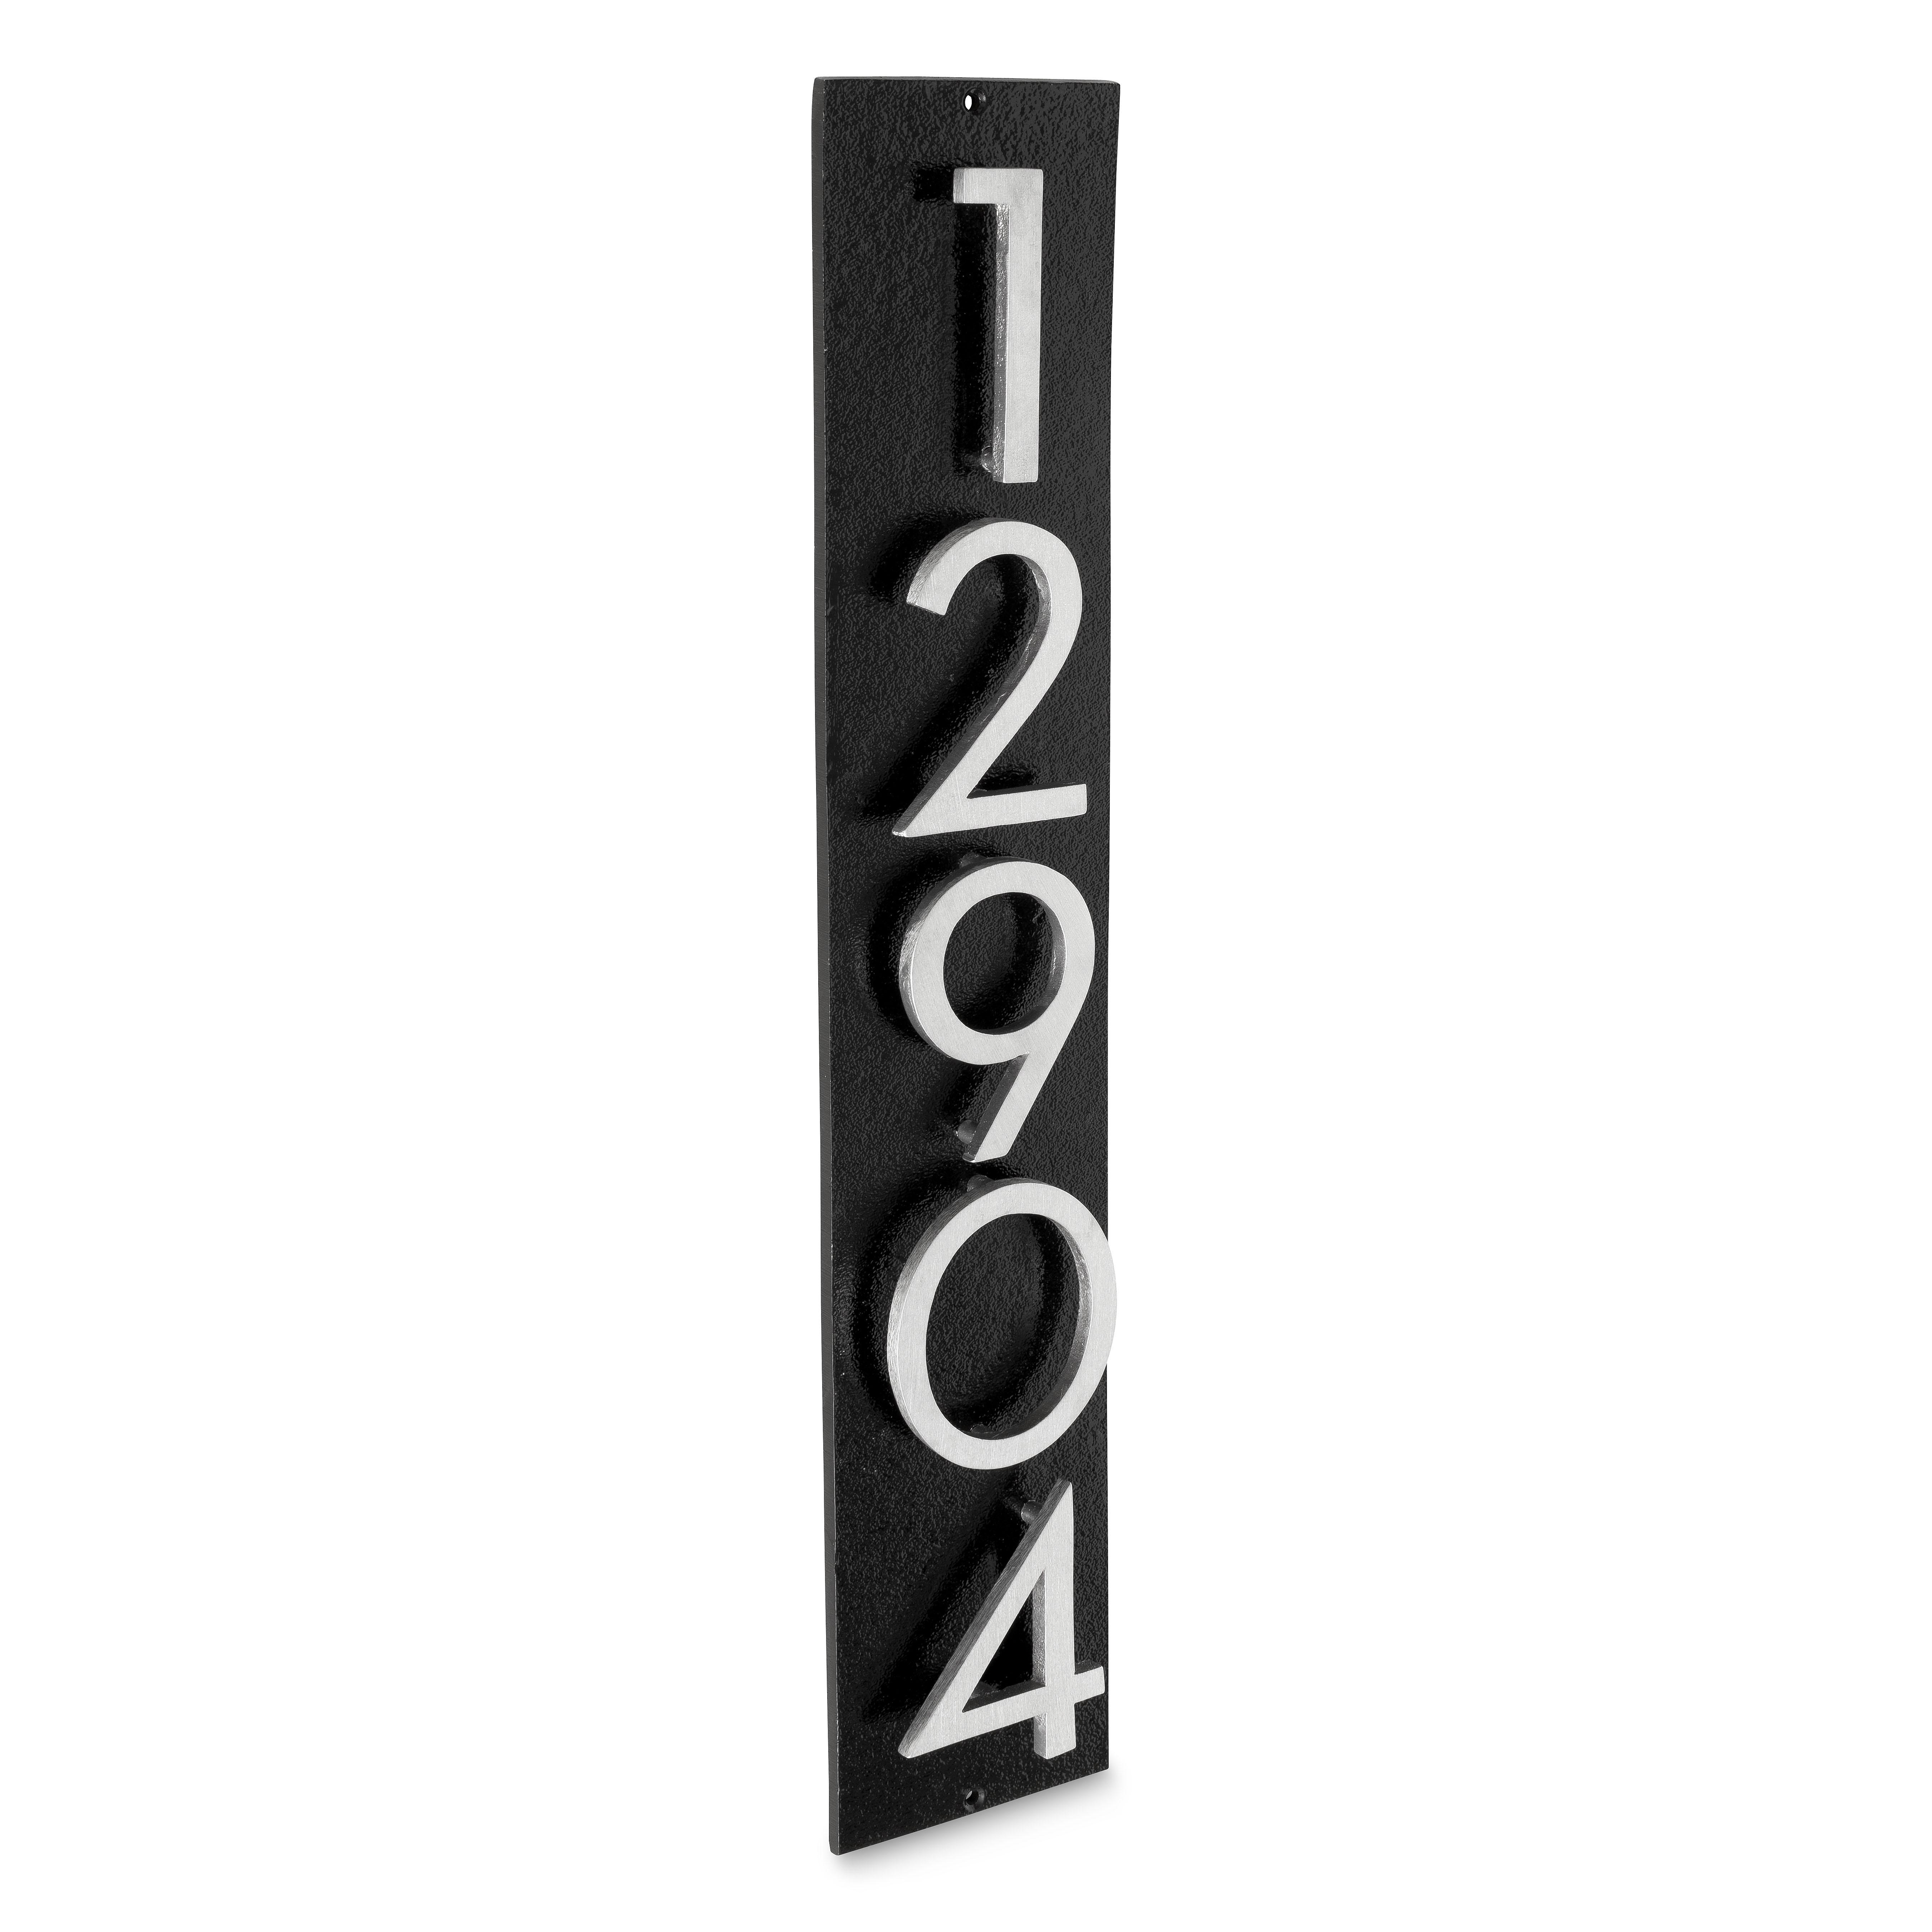 Floating Modern 3 Number Vertical Address Plaque 5 Digits Montague Metal Products